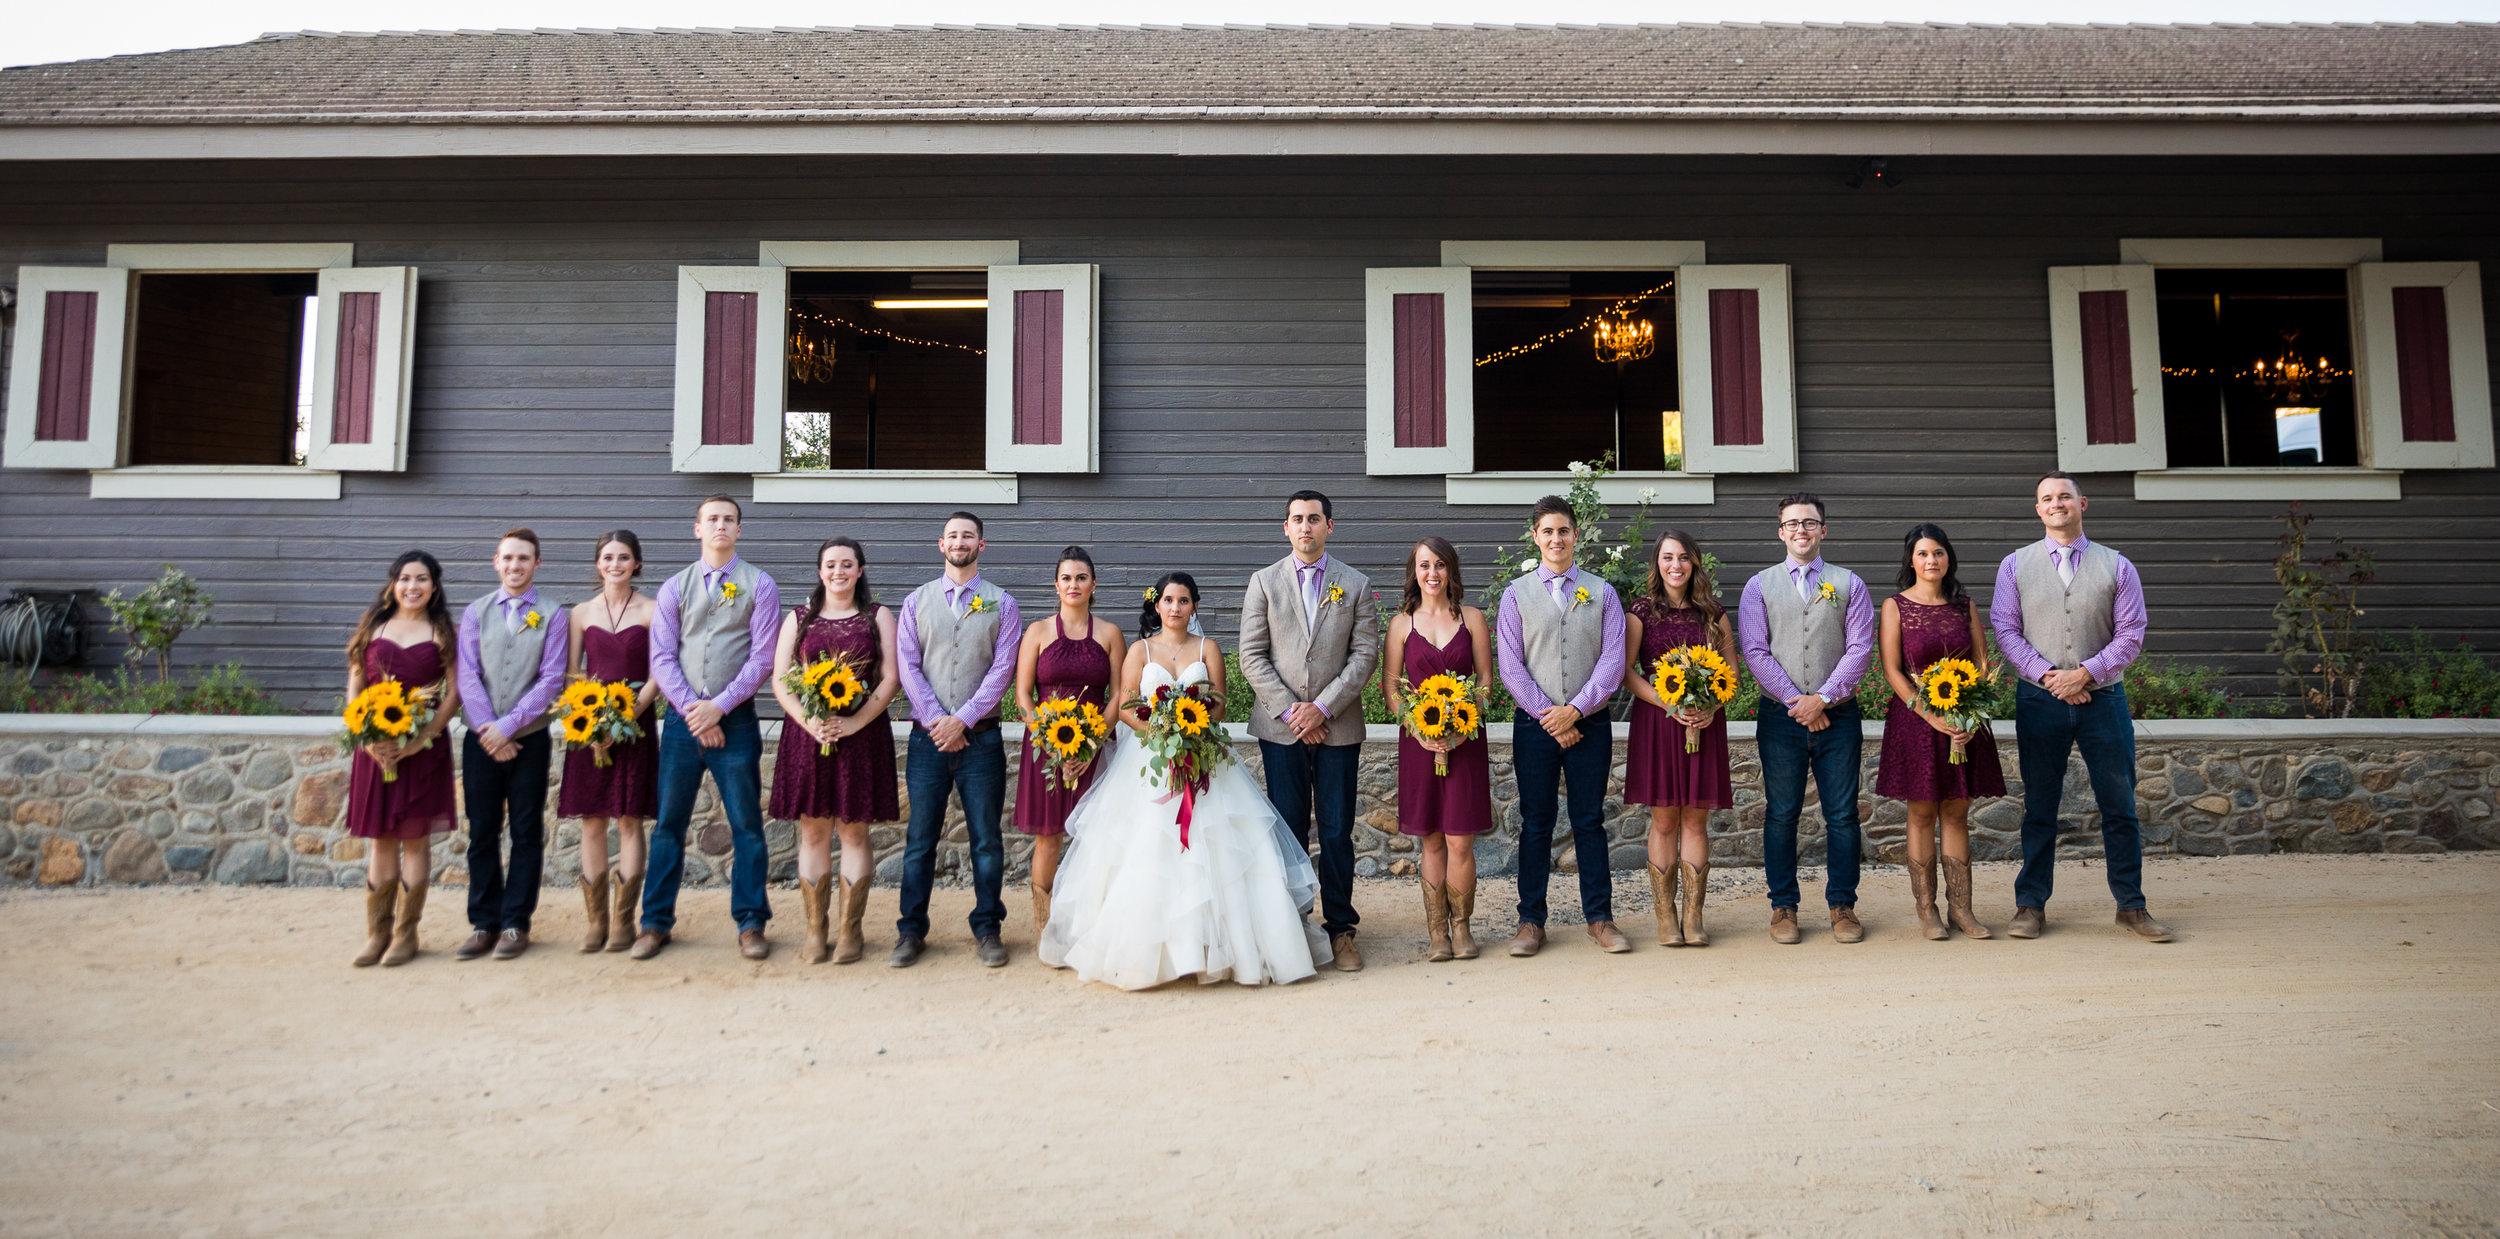 Johnson Wedding_Bridal Party + Romantics-16.jpg